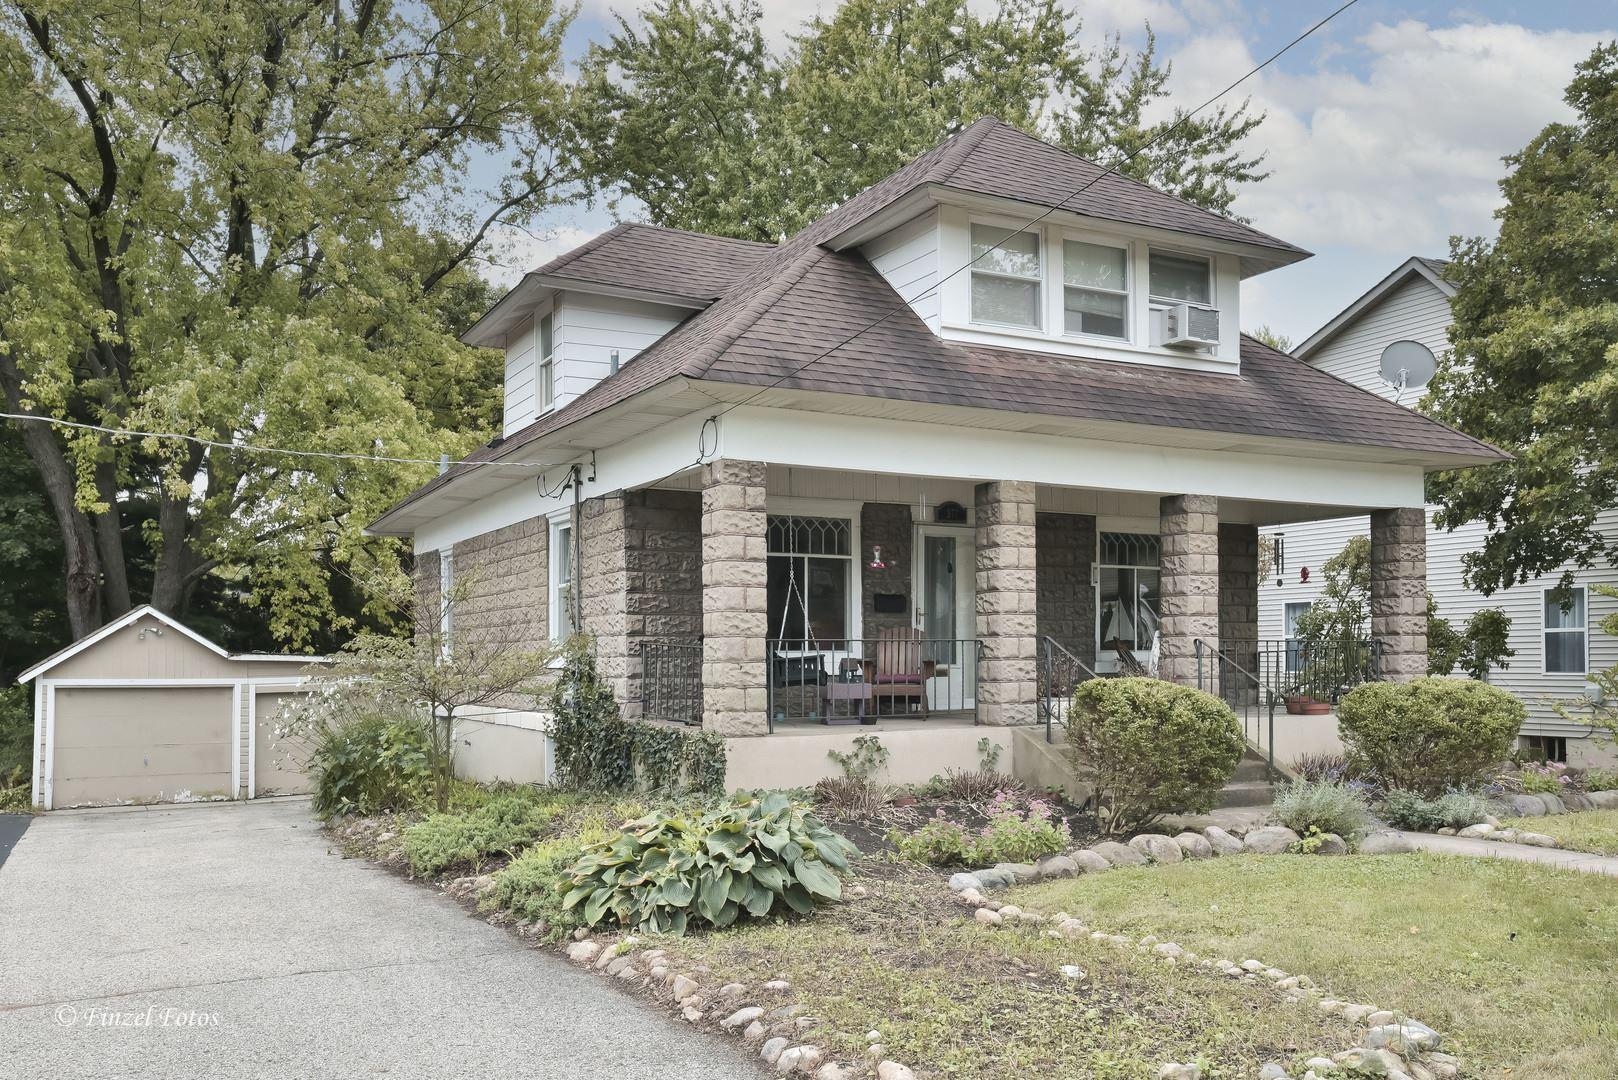 377 Fairview Park Avenue, Crystal Lake, IL 60014 - #: 11241852